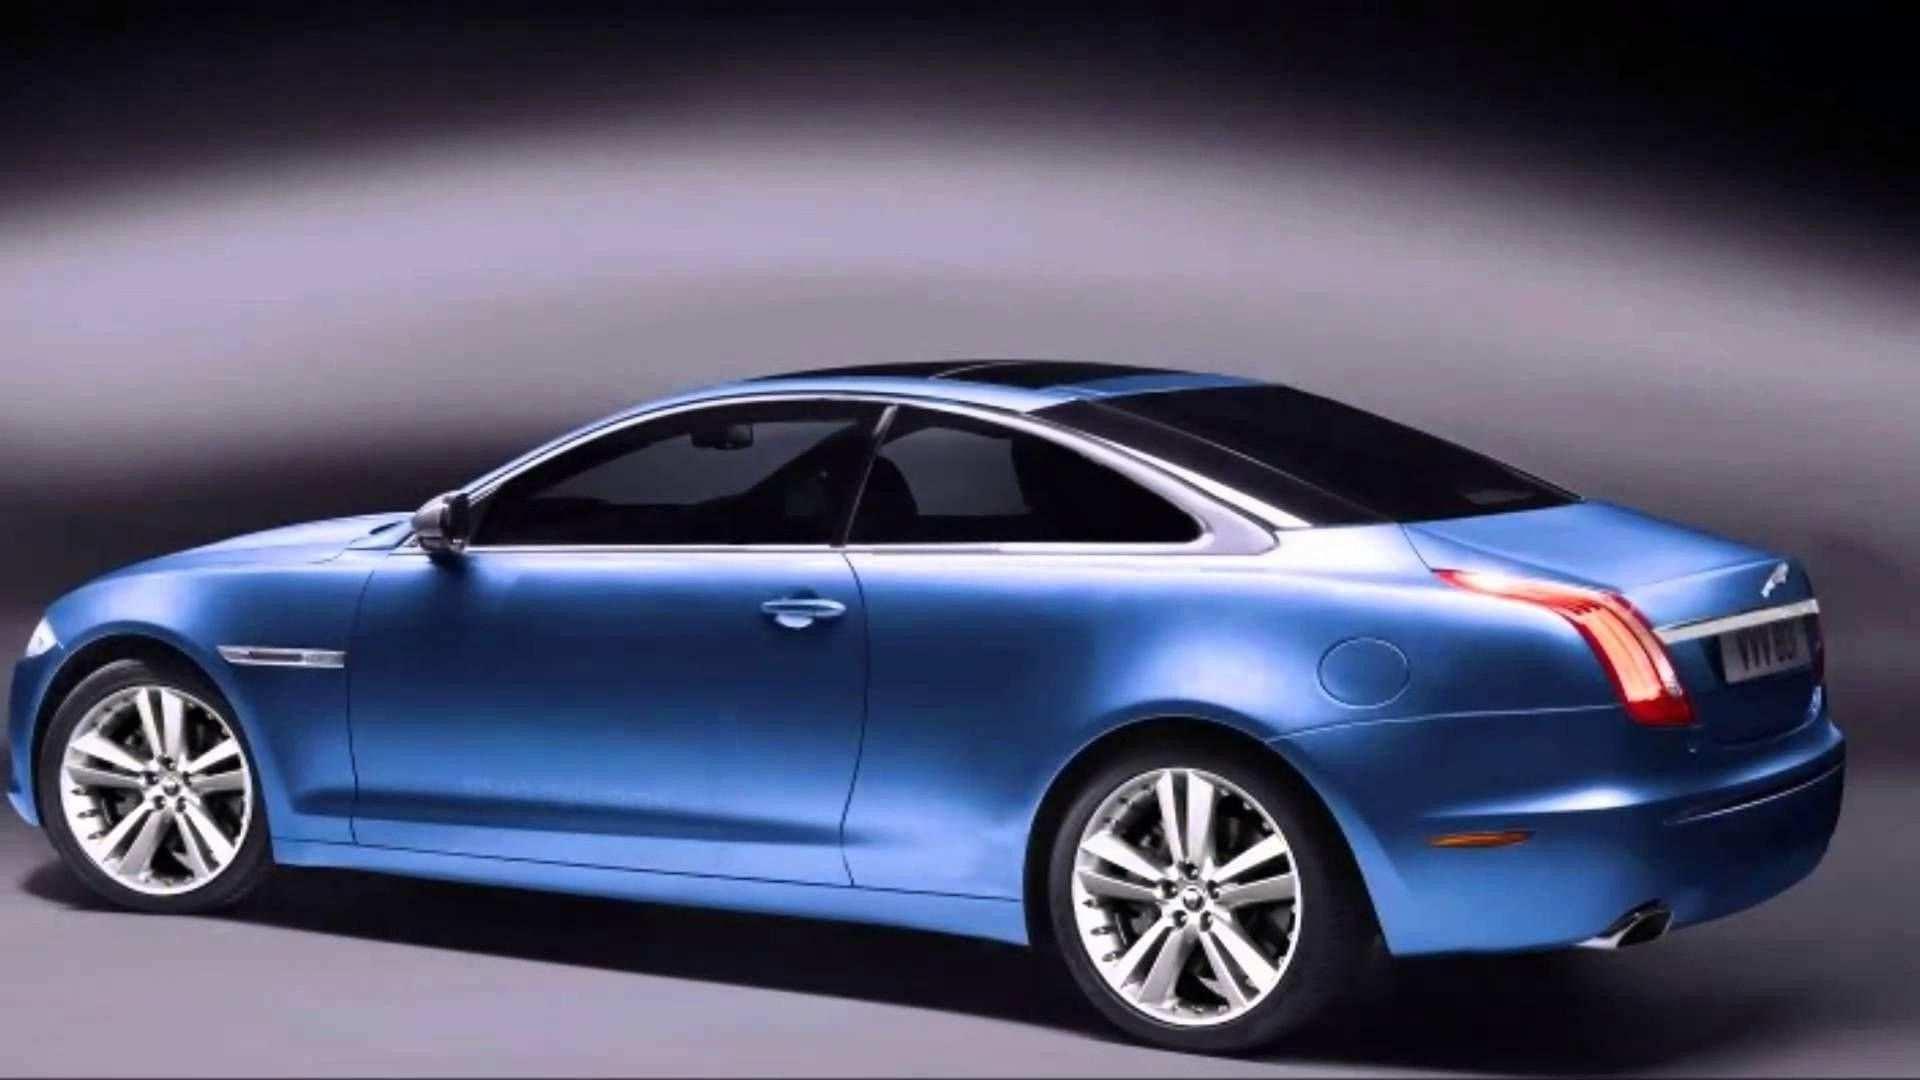 31 Gallery of Jaguar Xj Coupe 2019 Review by Jaguar Xj Coupe 2019